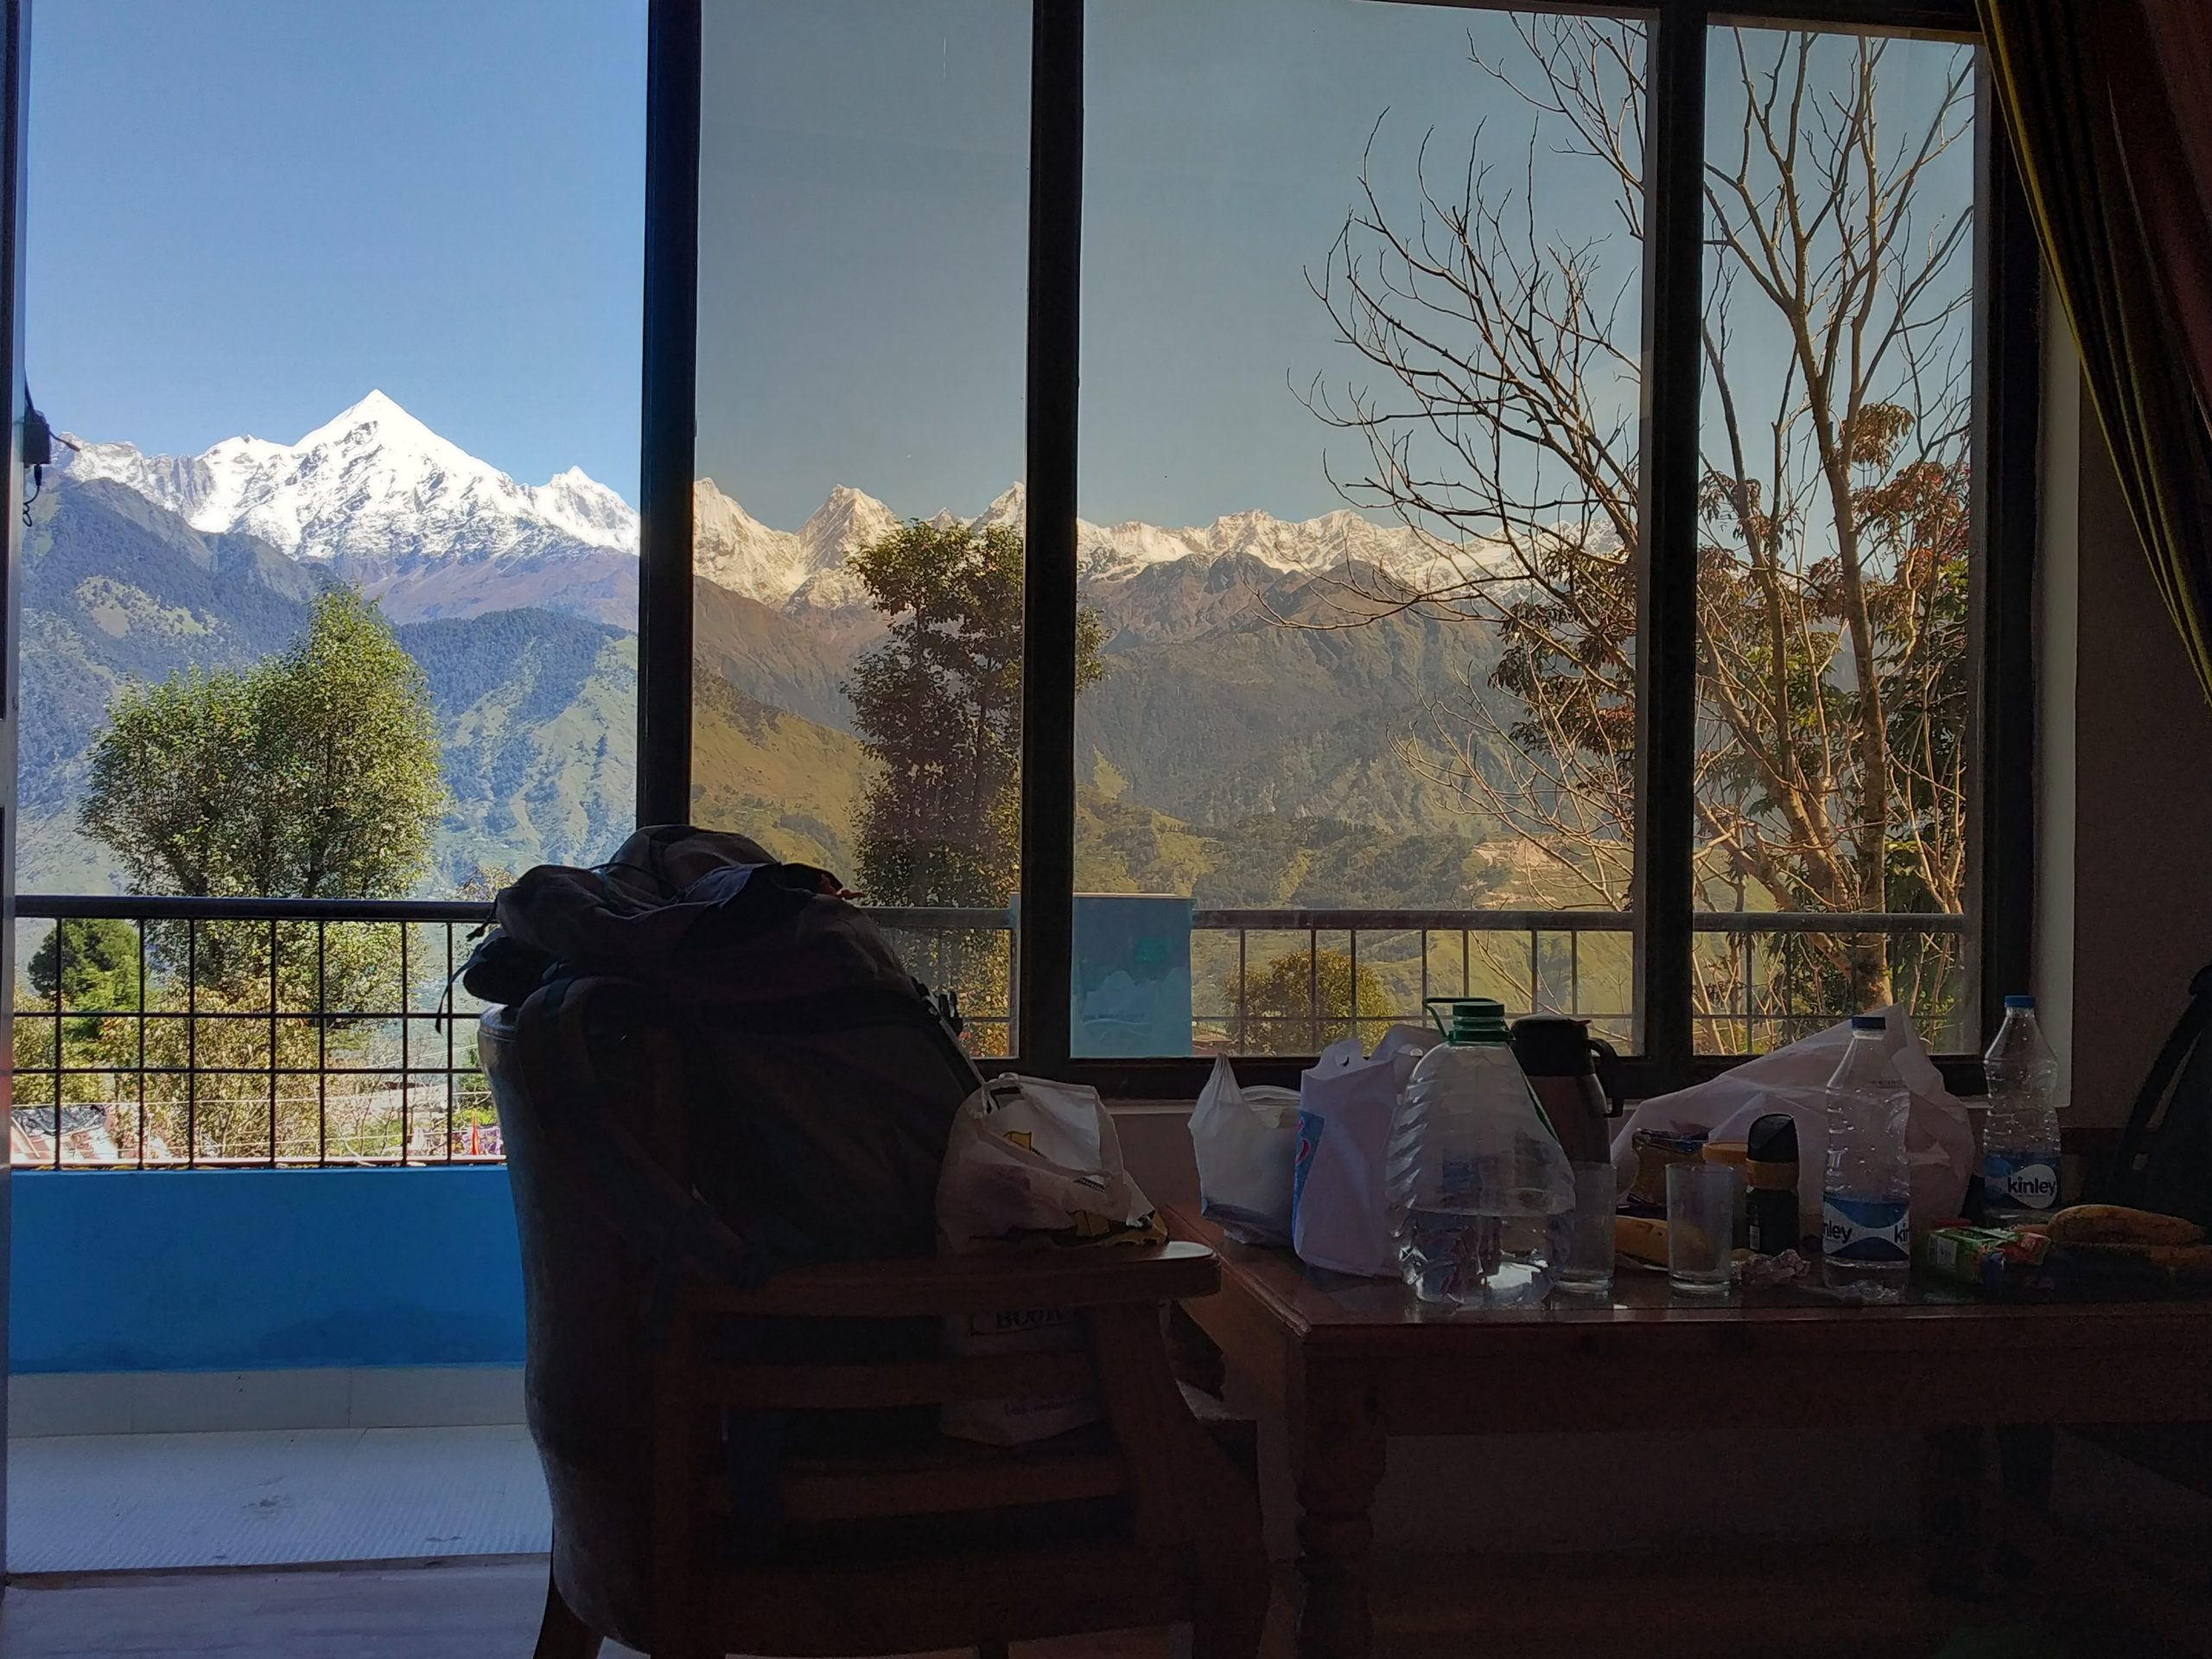 Panchachuli peaks